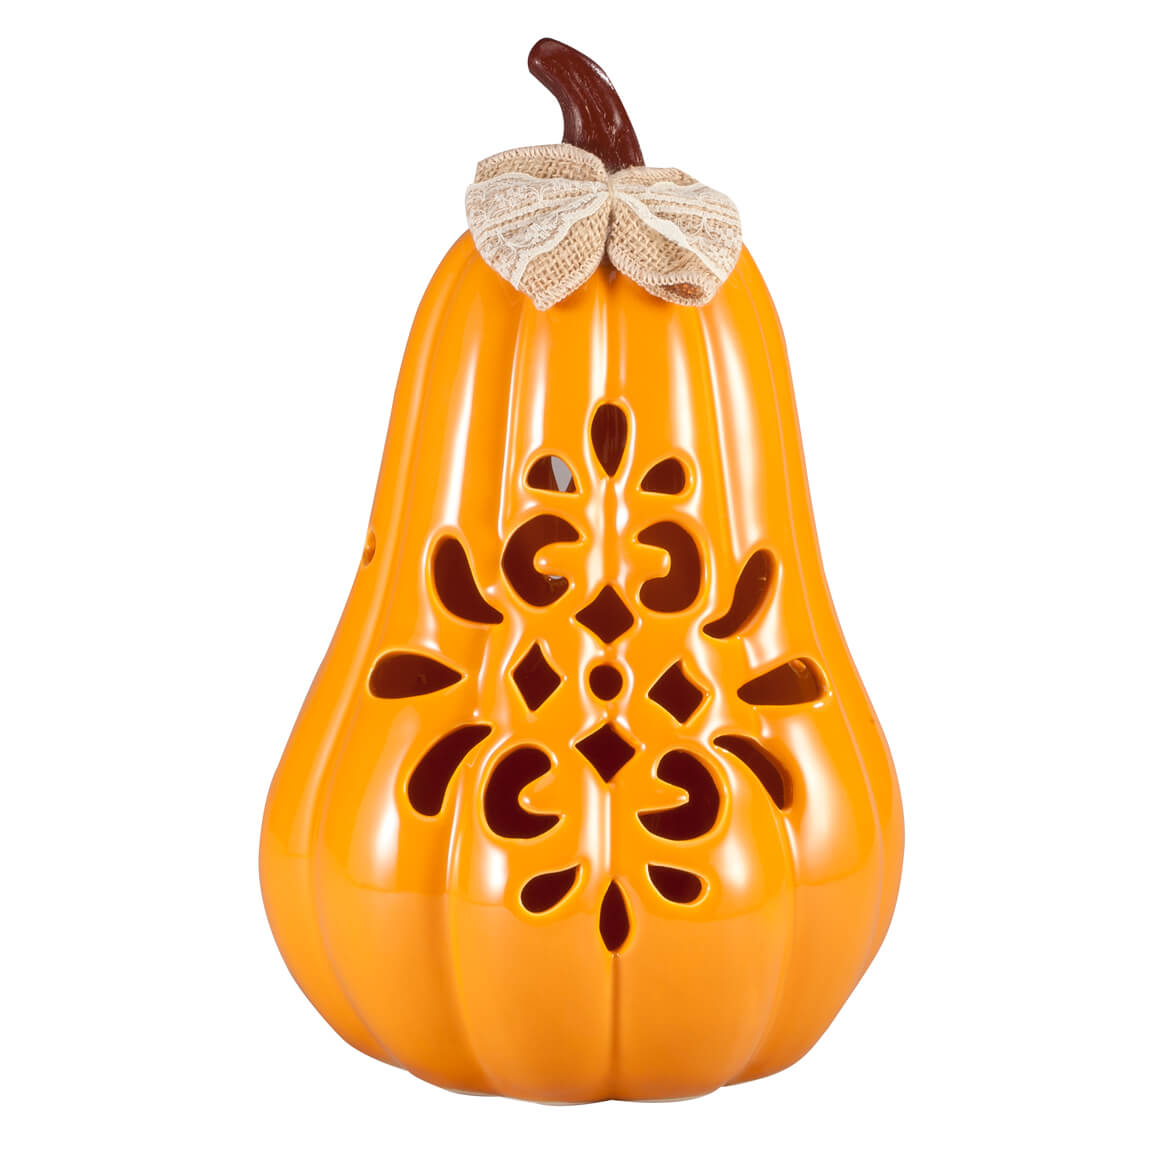 Large Ceramic Decorative Pumpkin